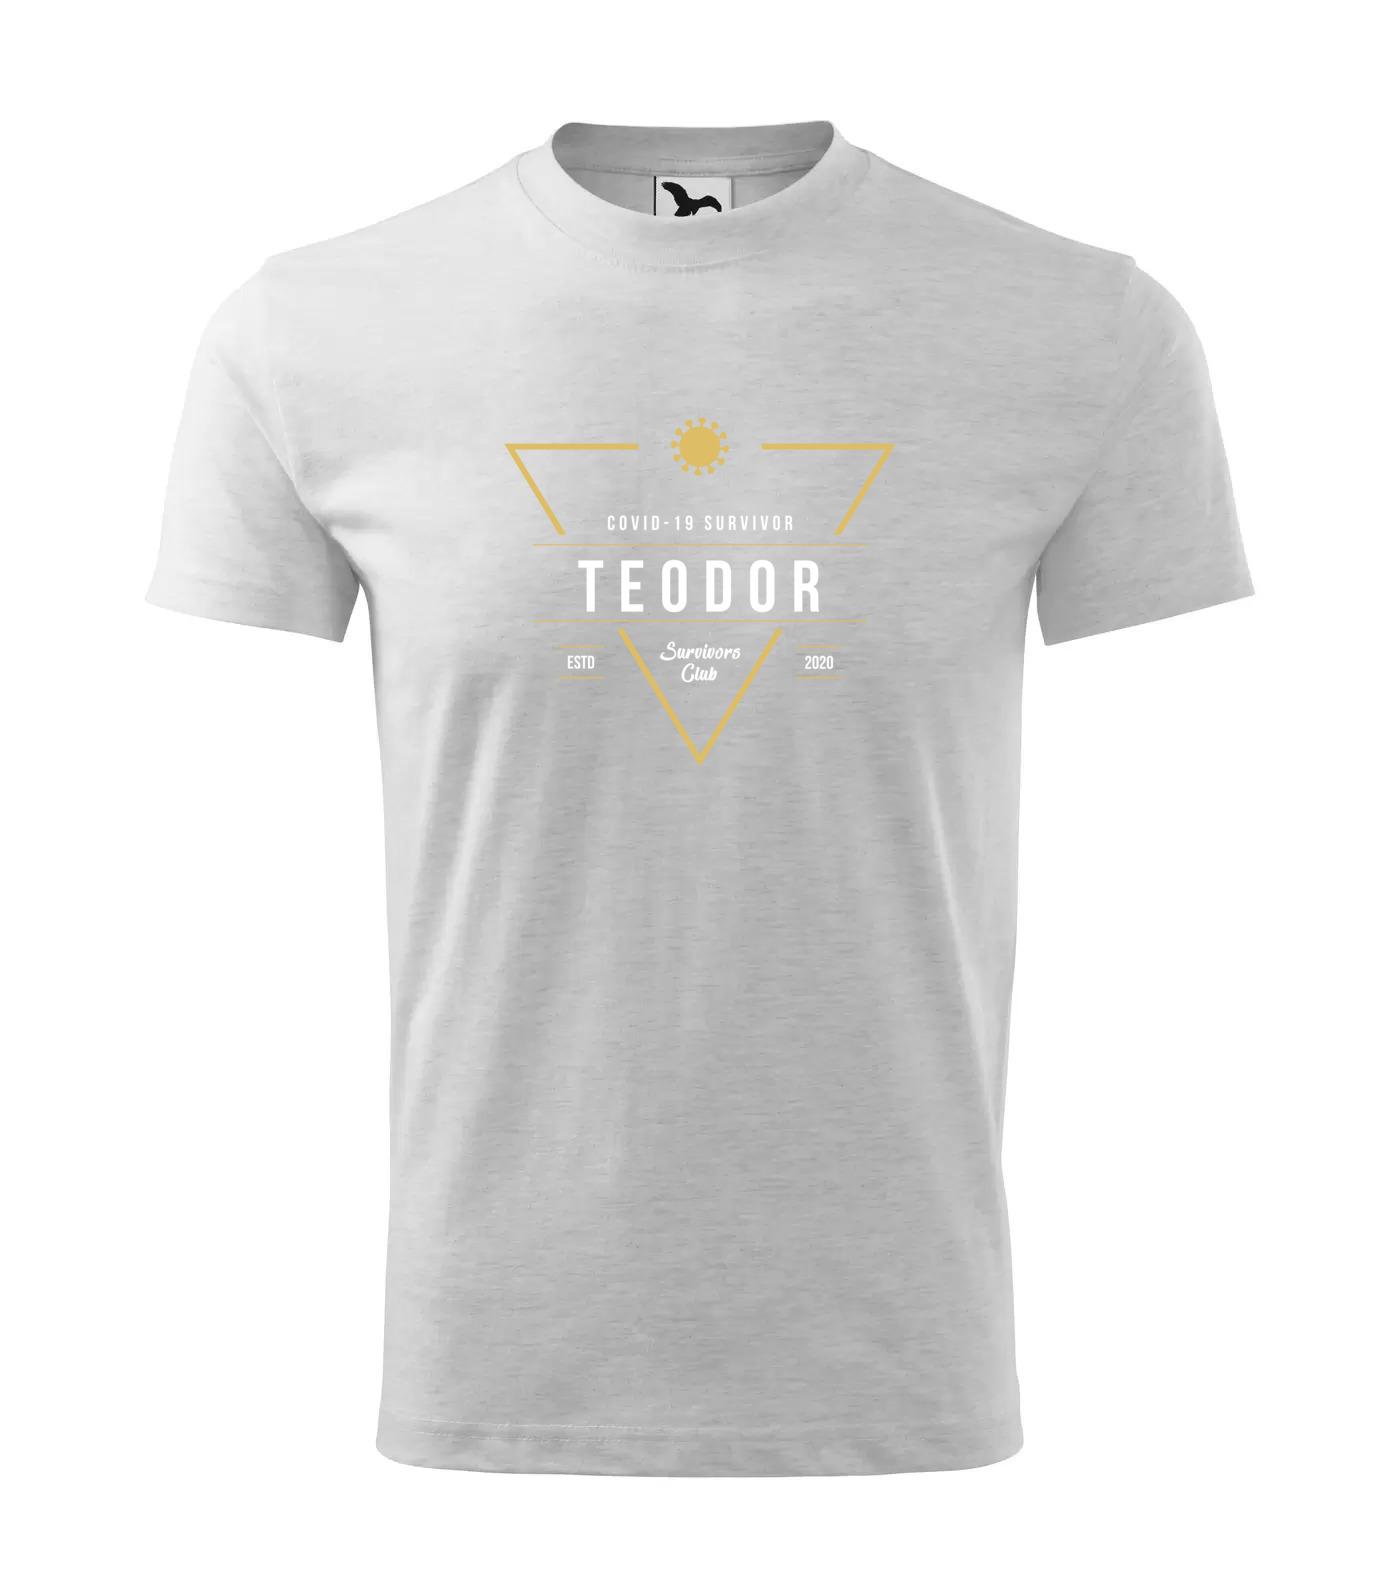 Tričko Survivor Club Teodor